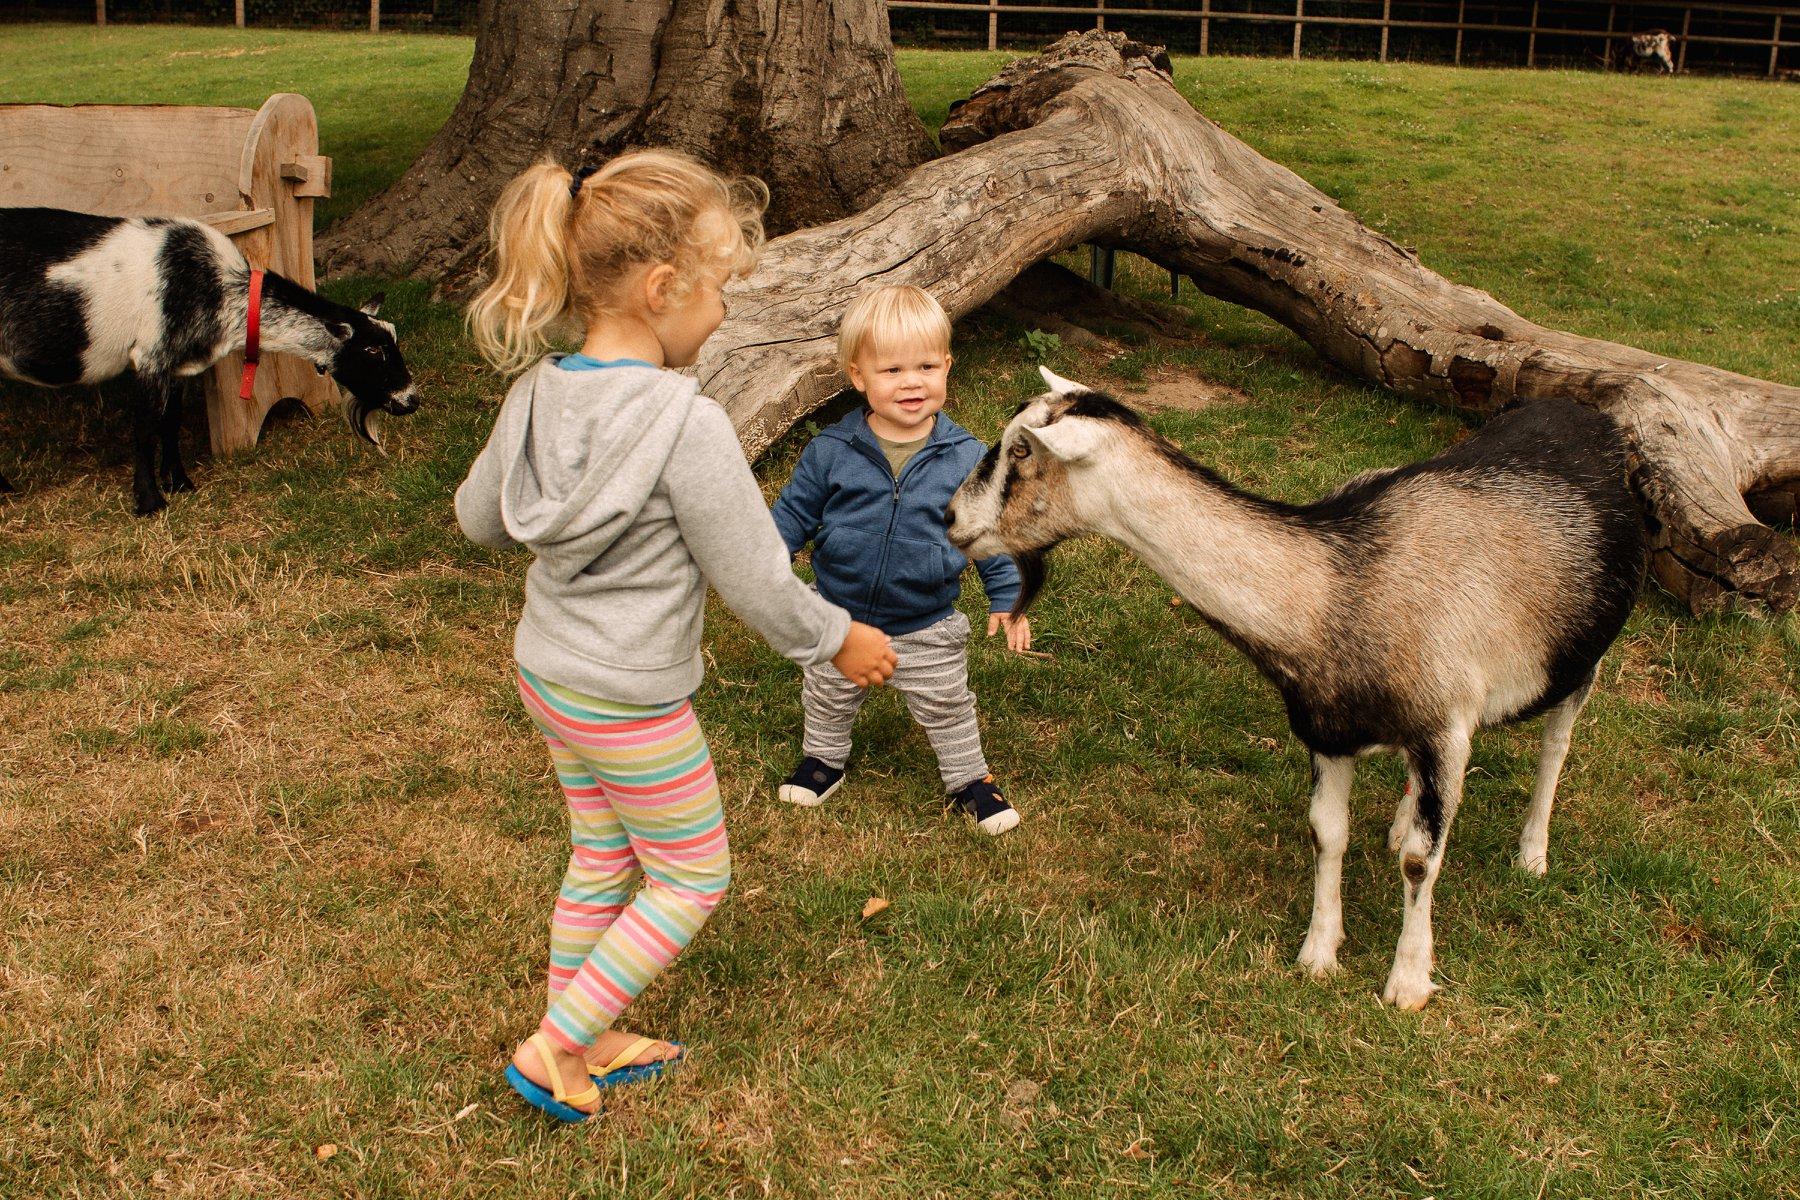 dougal photography, farm photography, inspiration photography, farm photography, maternity photography